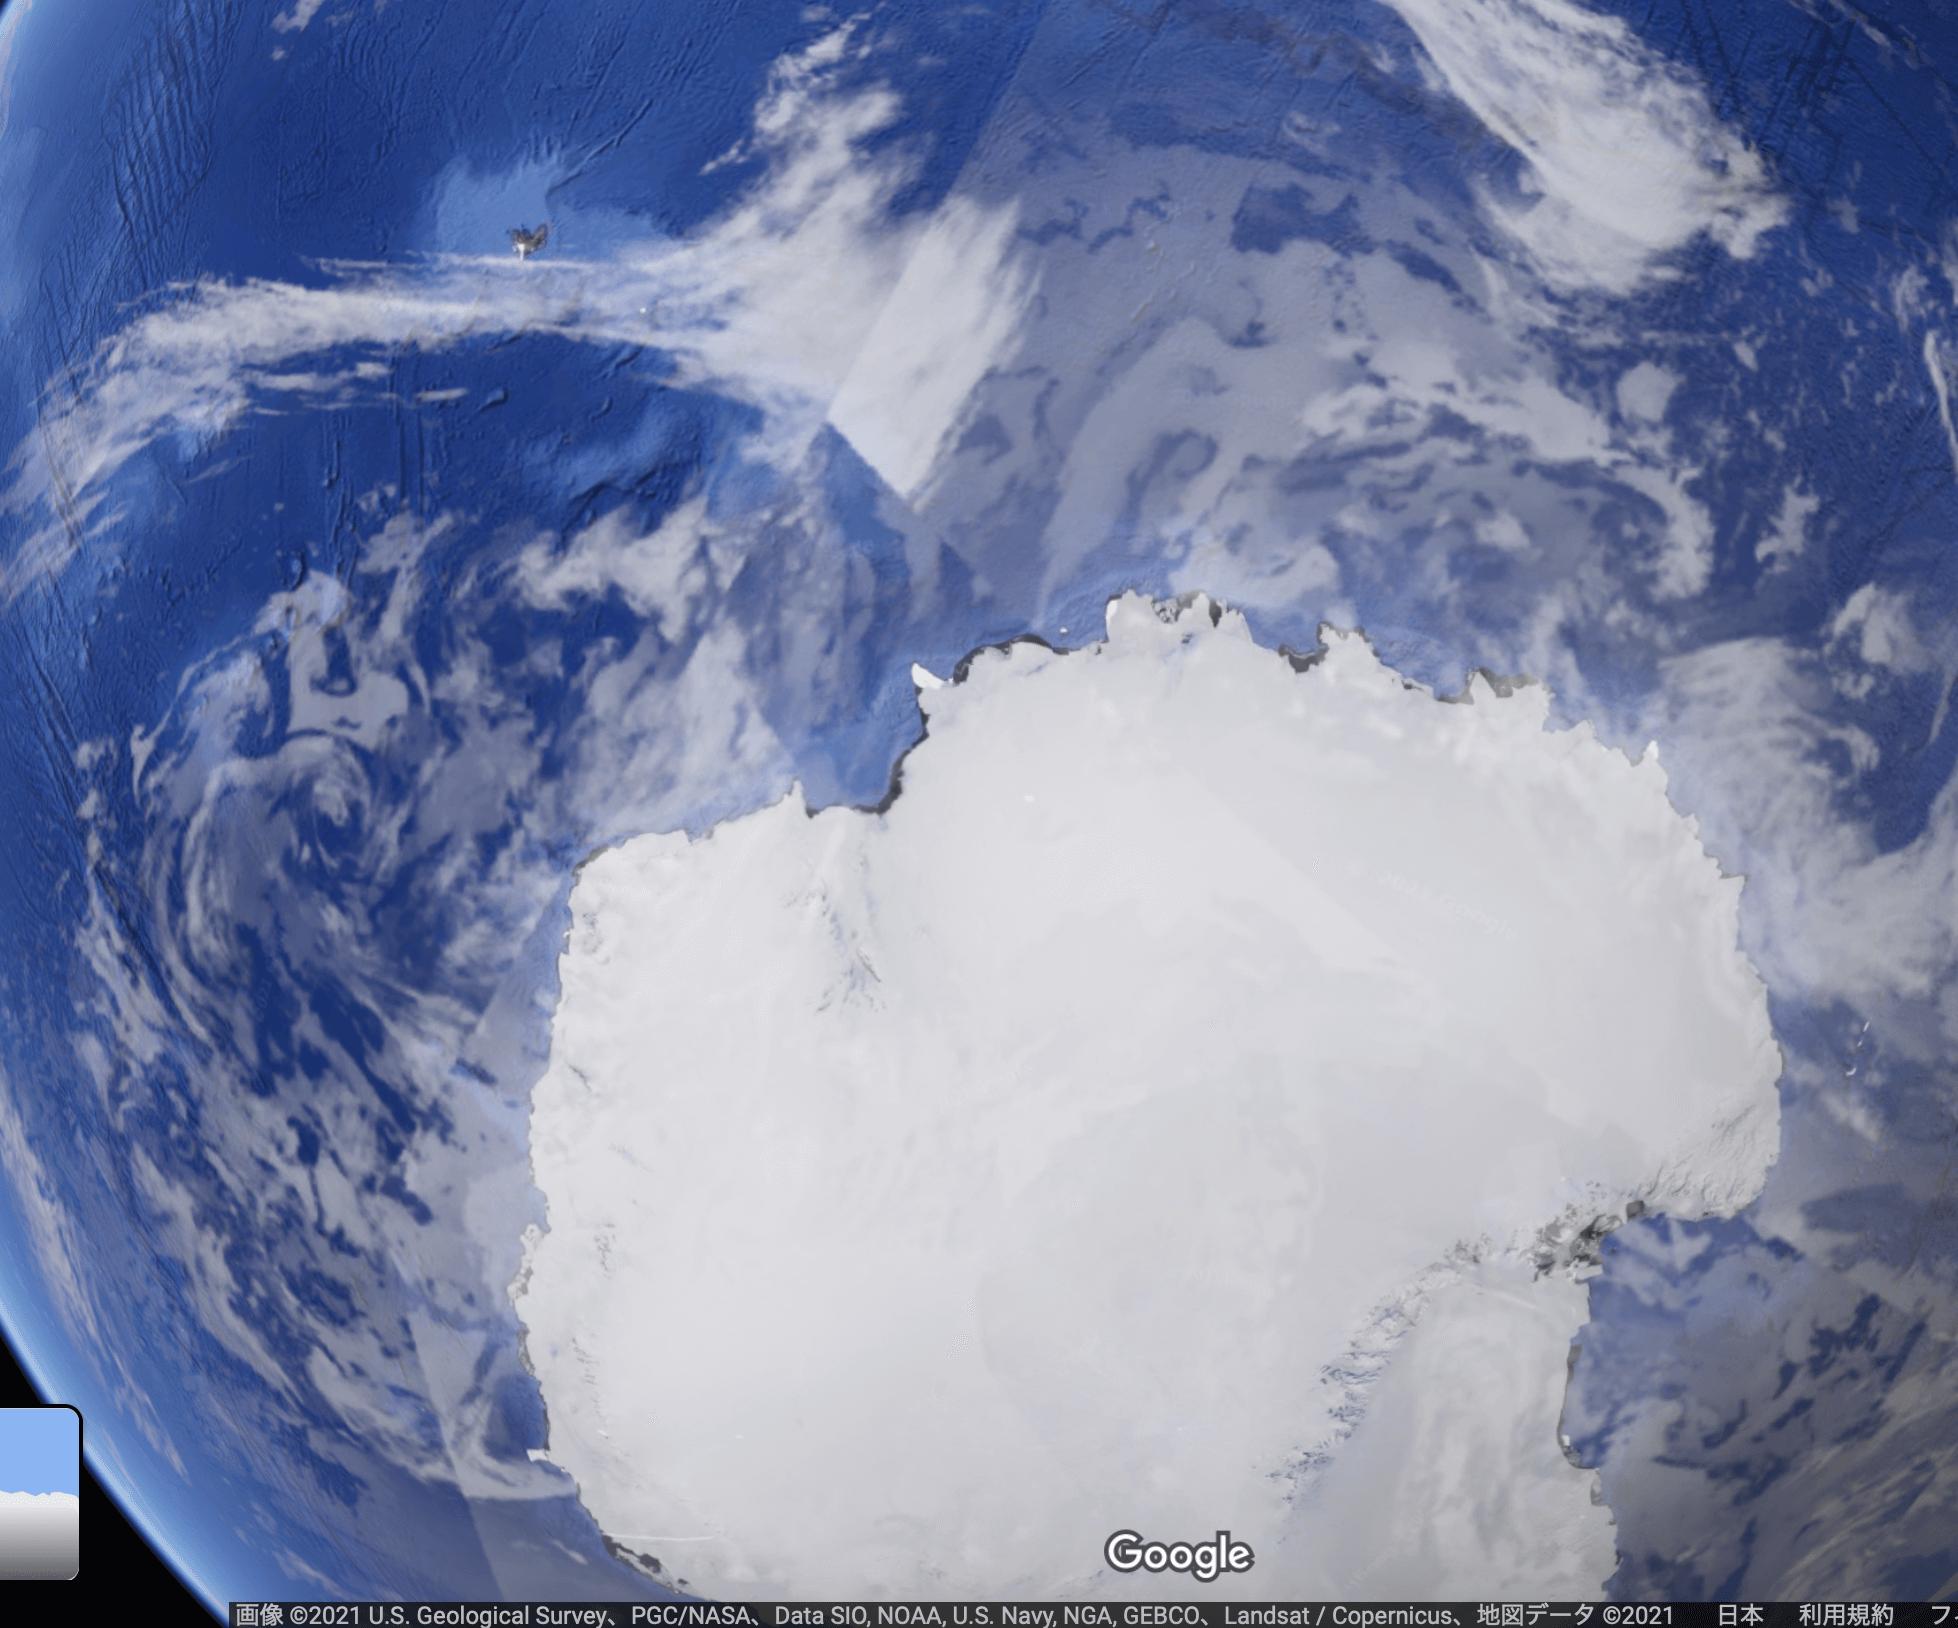 1a009b421c812002bc984b1e3ab9d4e5 - 南極条約が切れる!2048年は波乱が決定している!